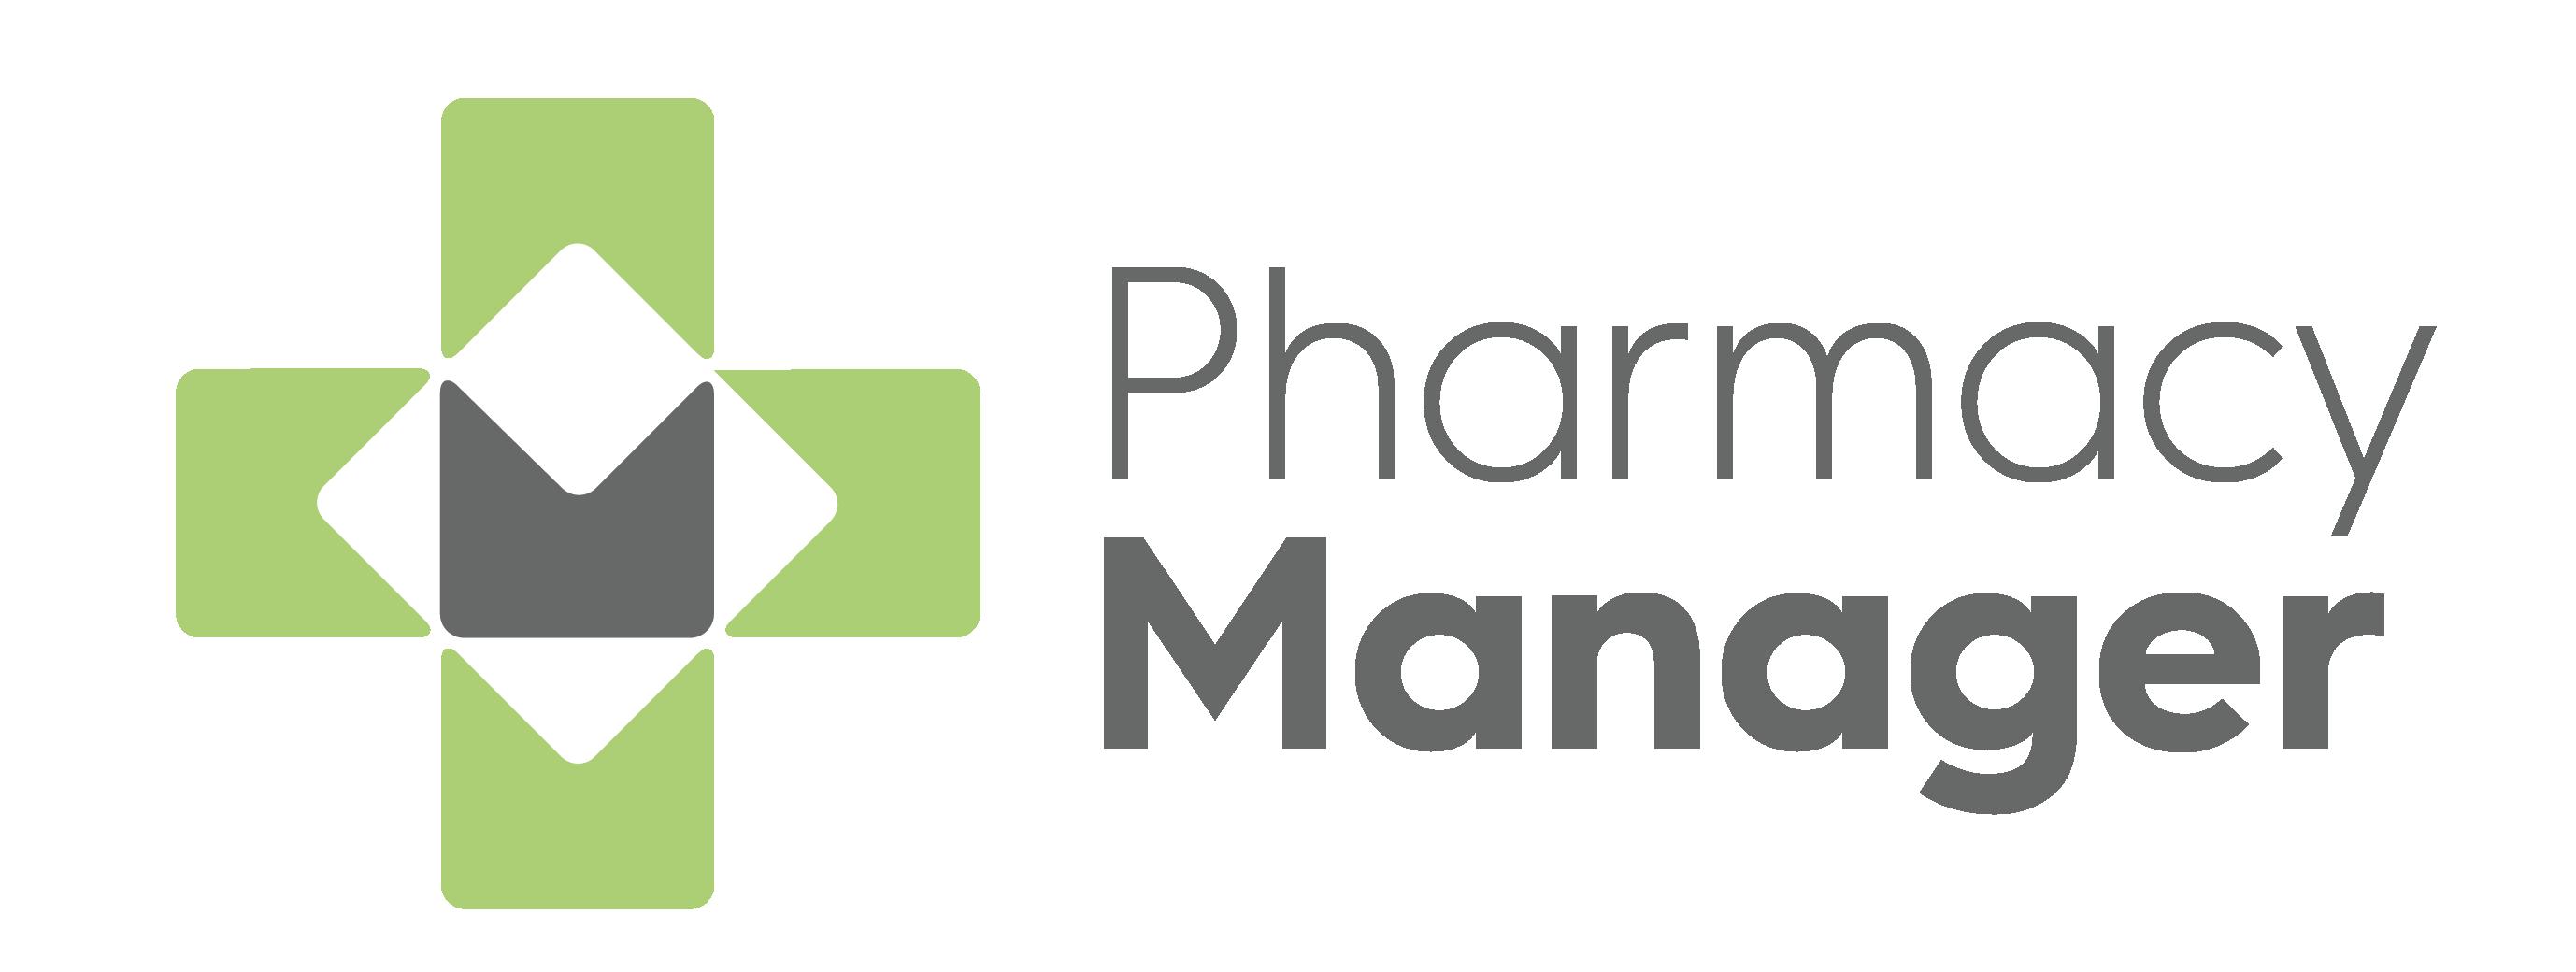 Pharmacy Manager logo